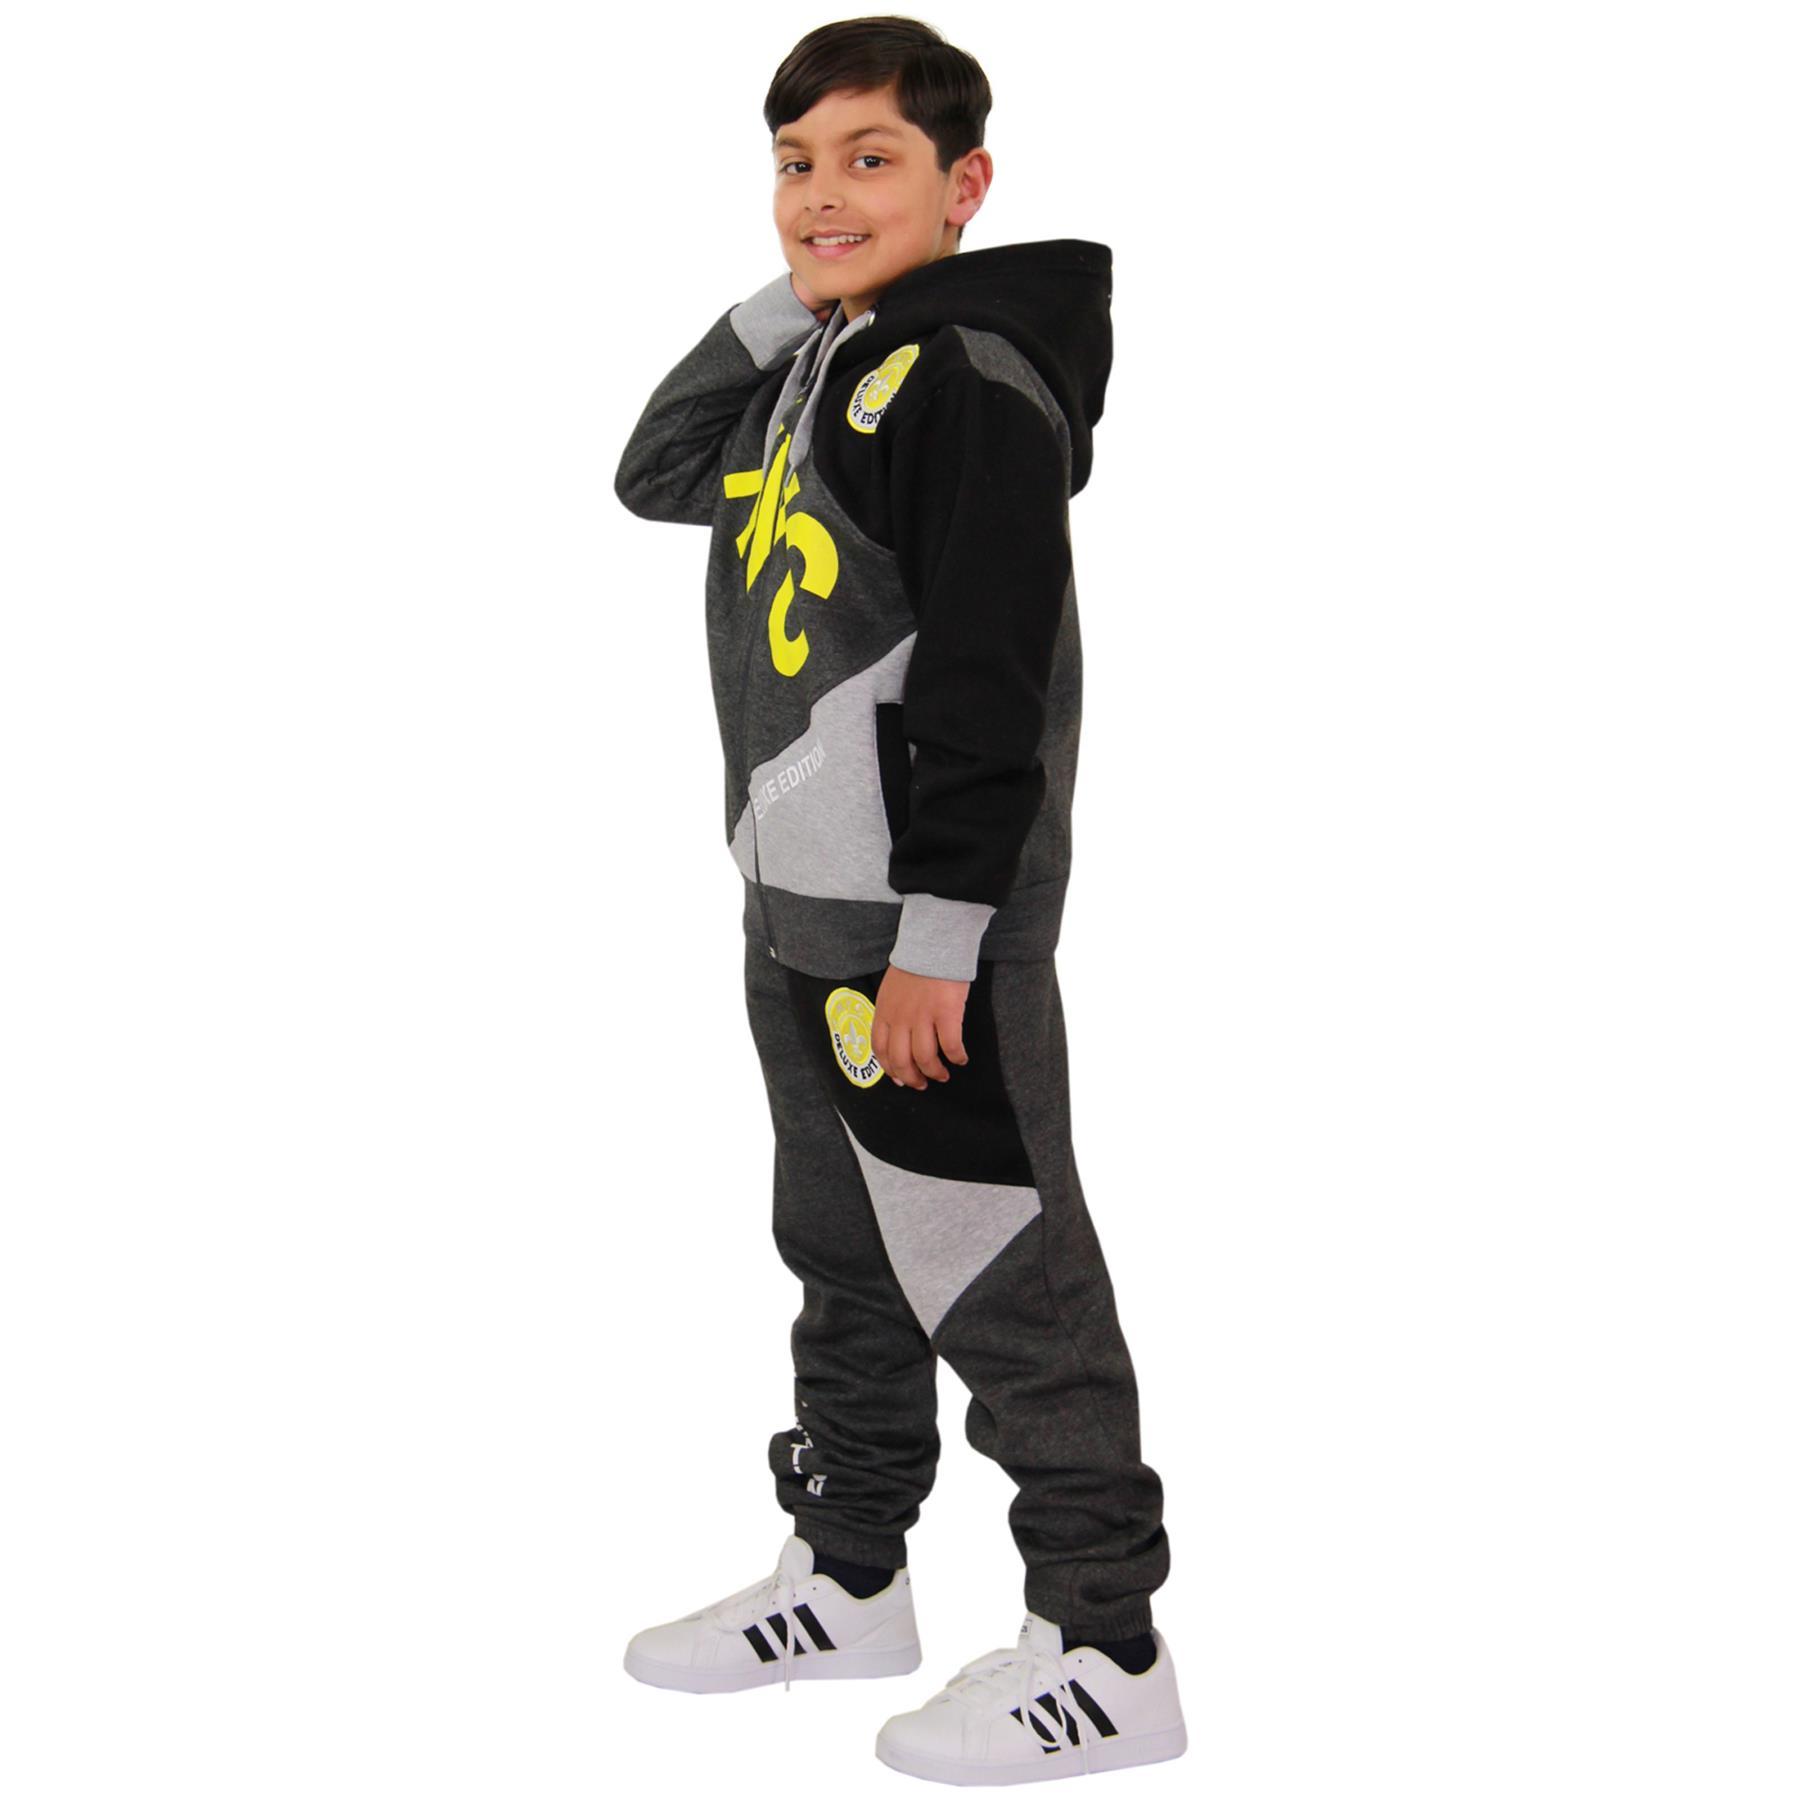 a2z4kids Kids Boys Tracksuit NYC DLX Project Print Hoodie /& Bottom Jog Suit Age 7-13 Year